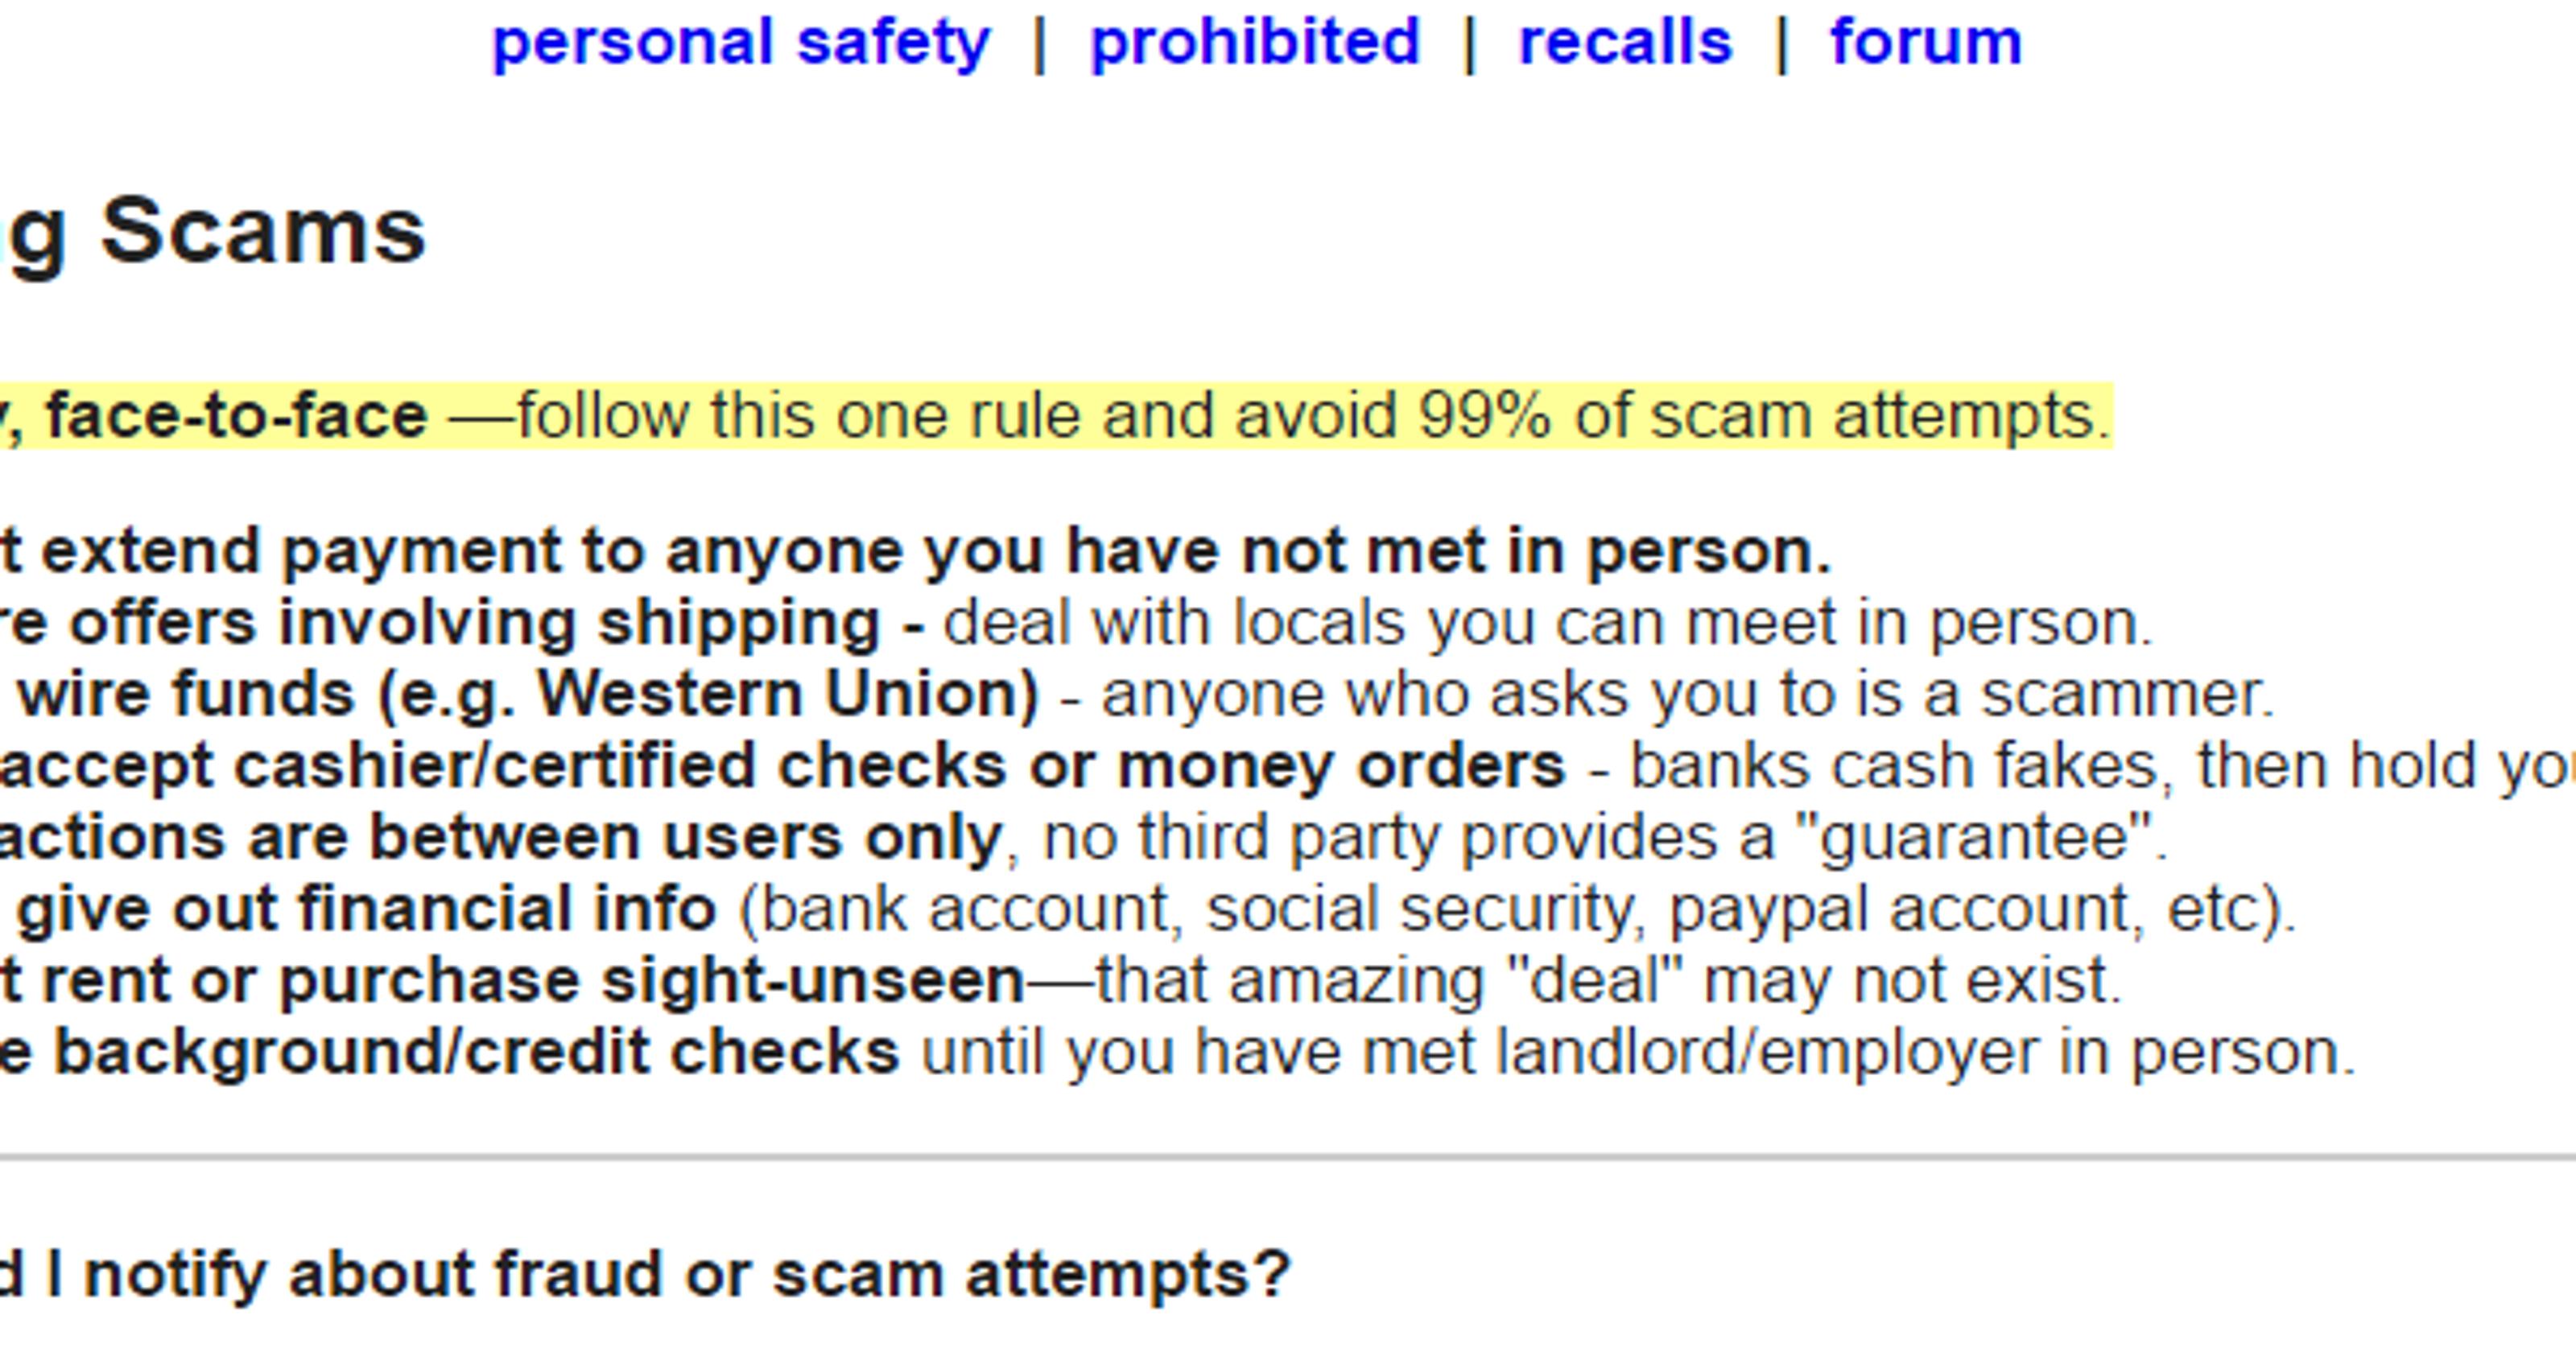 Boyle column: How I almost got scammed on Craigslist